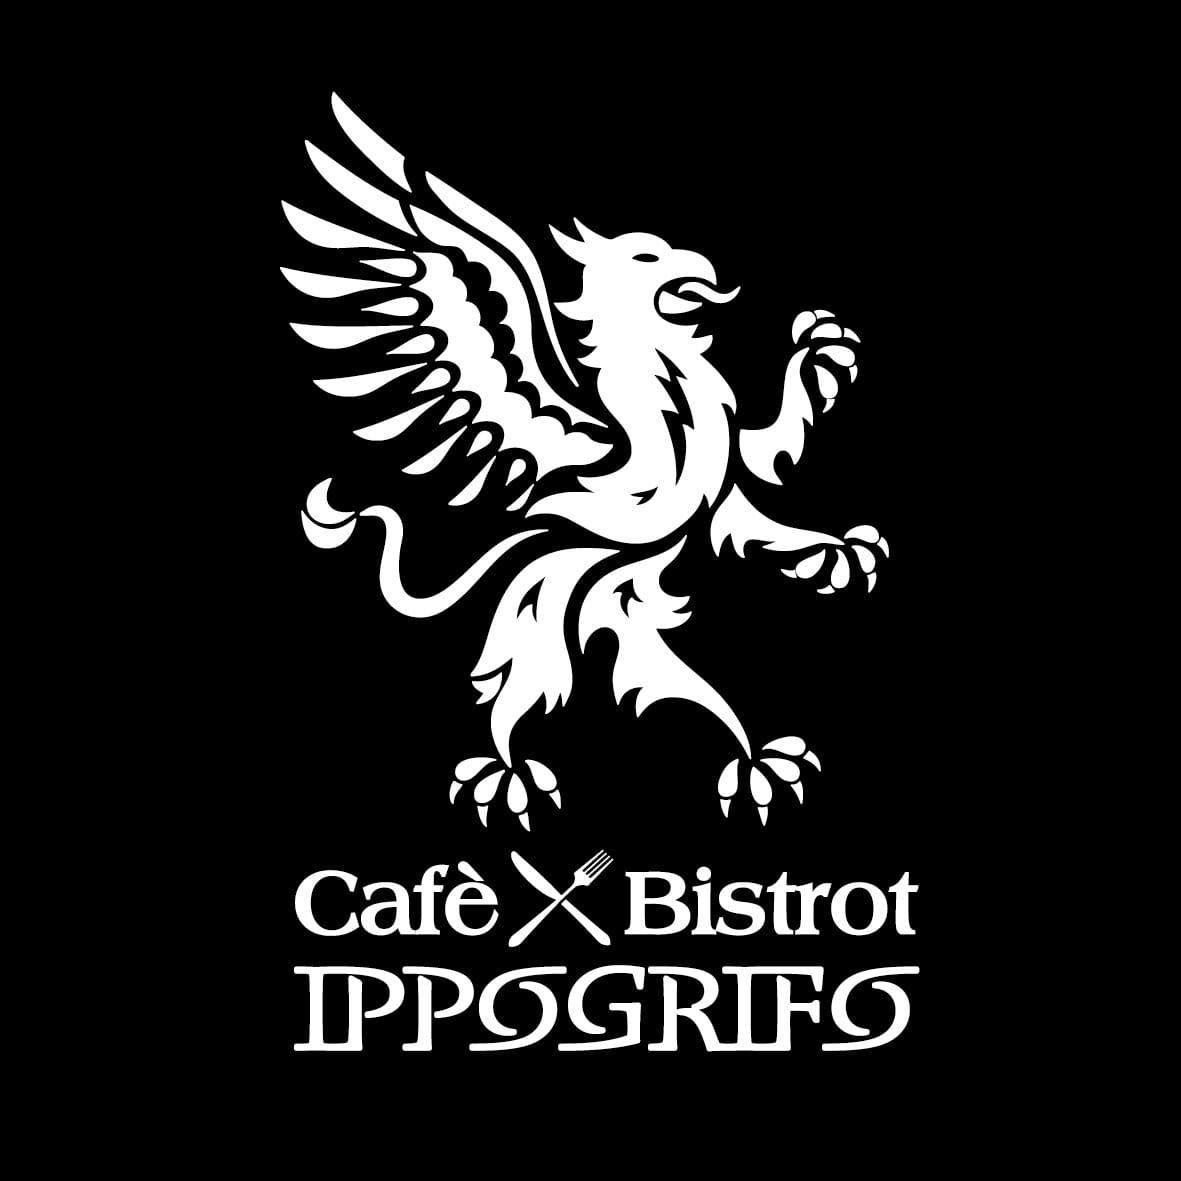 ippogrifo immagine